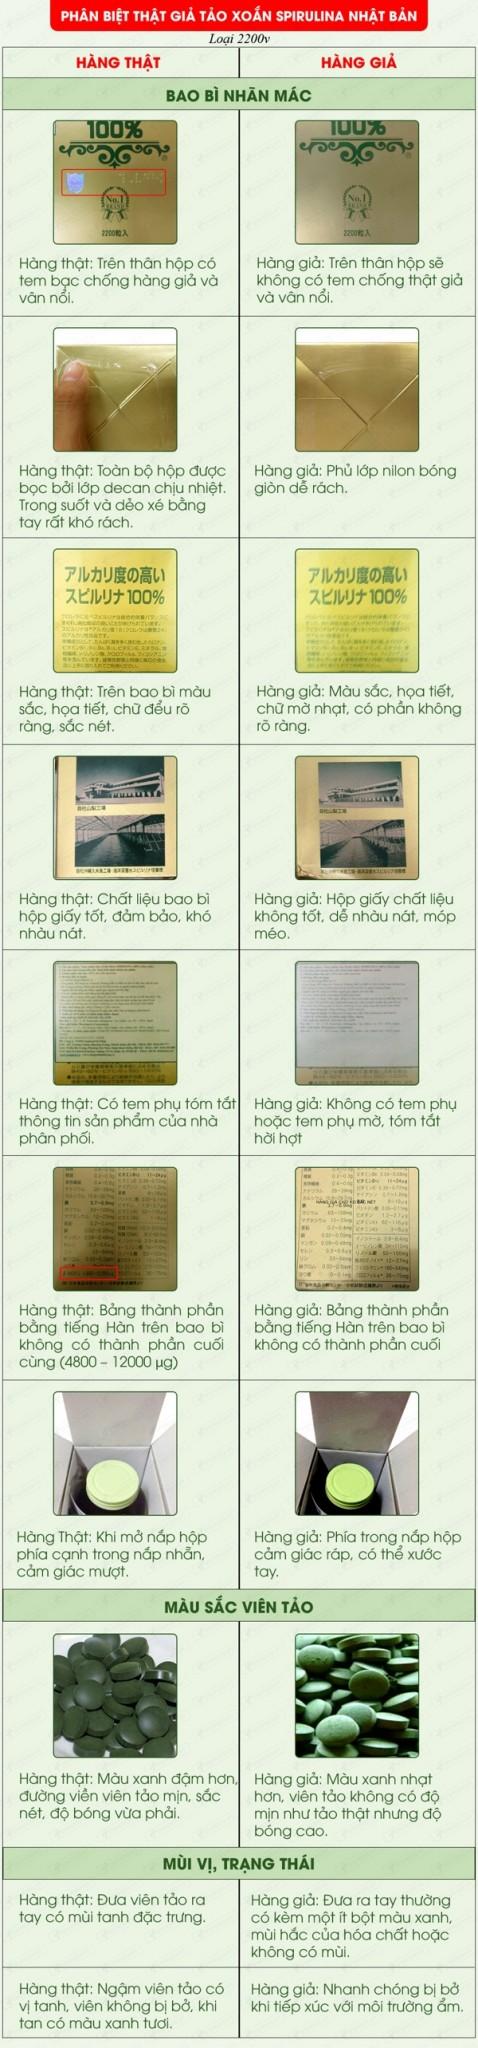 Tao Xoan Spirulina Nhat Ban 2200 vien - Lam dep da, Giam can, Ha huyet ap (3)